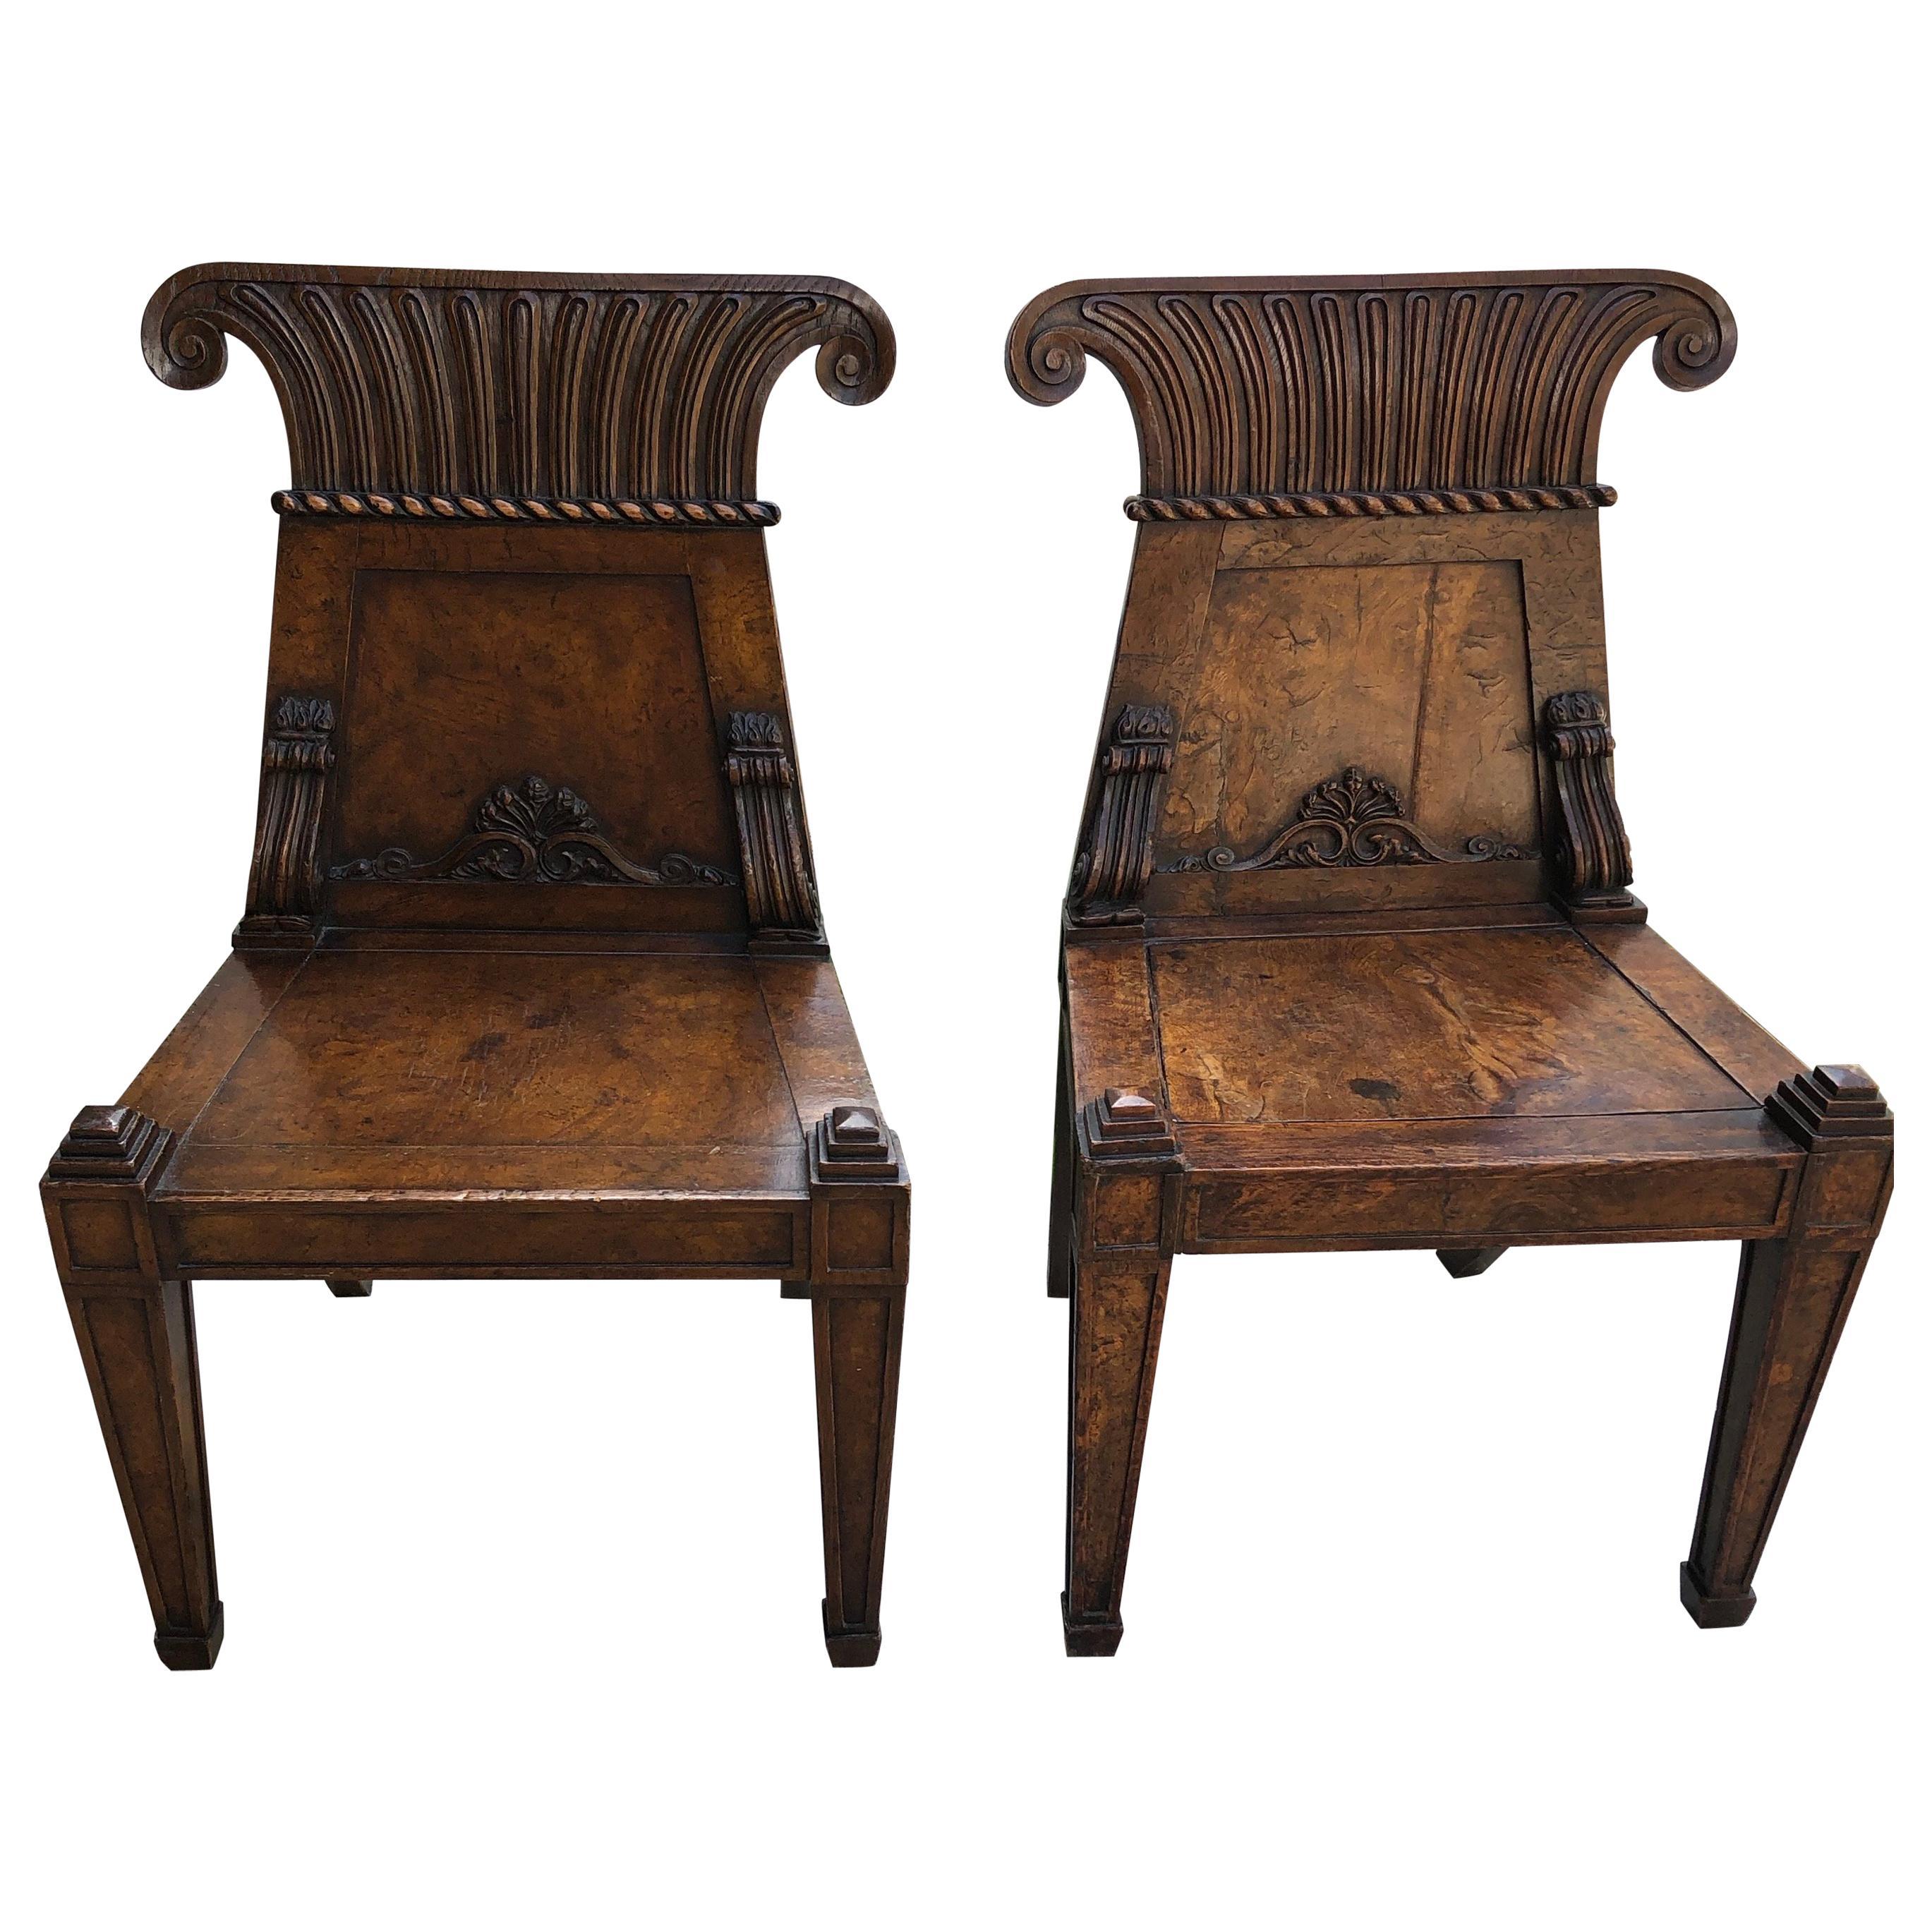 Pair of English Regency Burl Elmwood Hall Chairs/Side Chairs